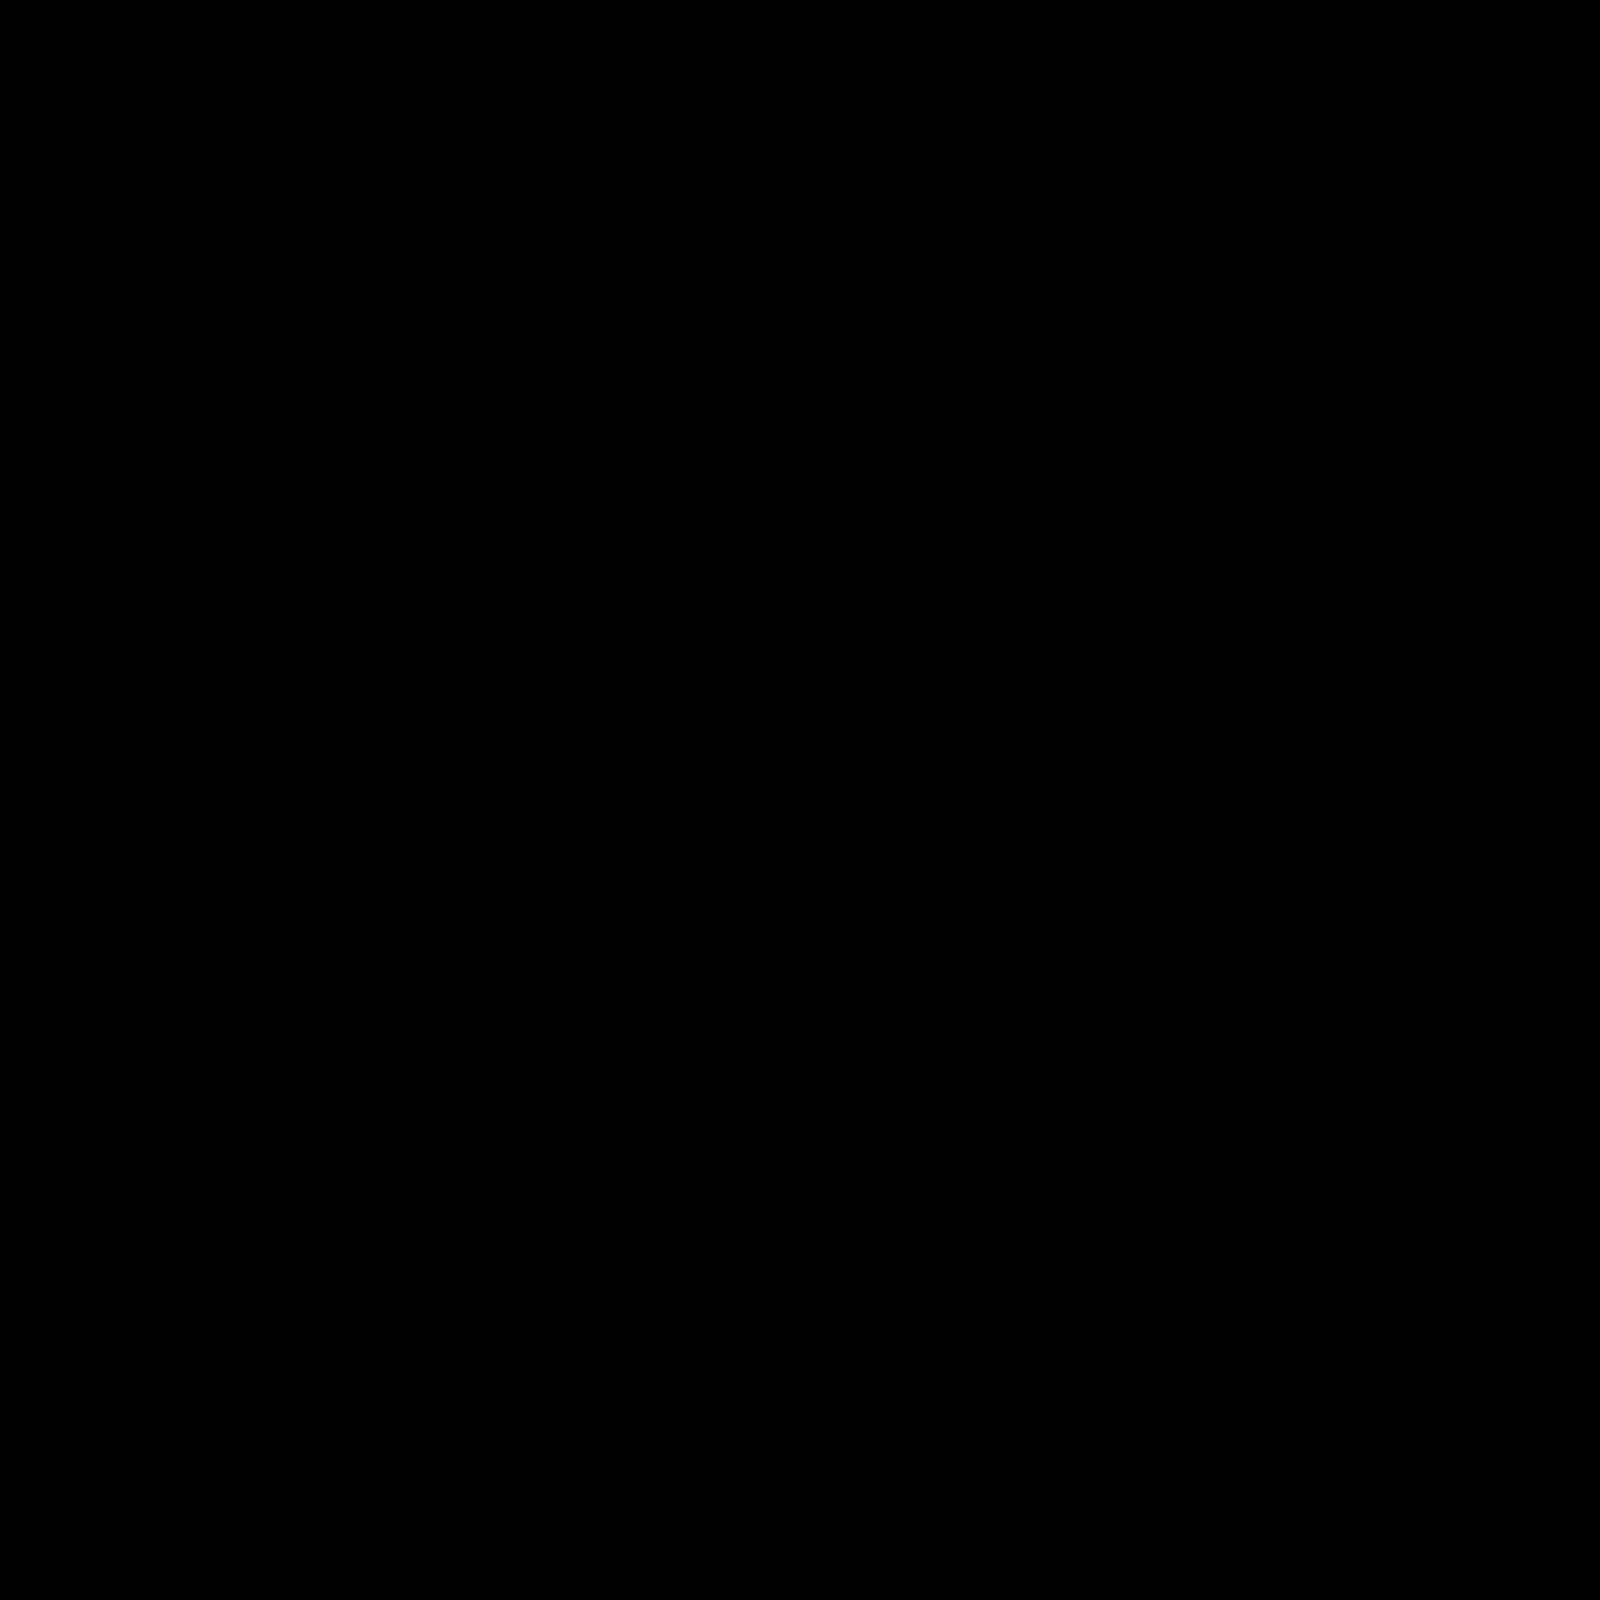 banner transparent library Vector crest svg. Ferrari logo png library